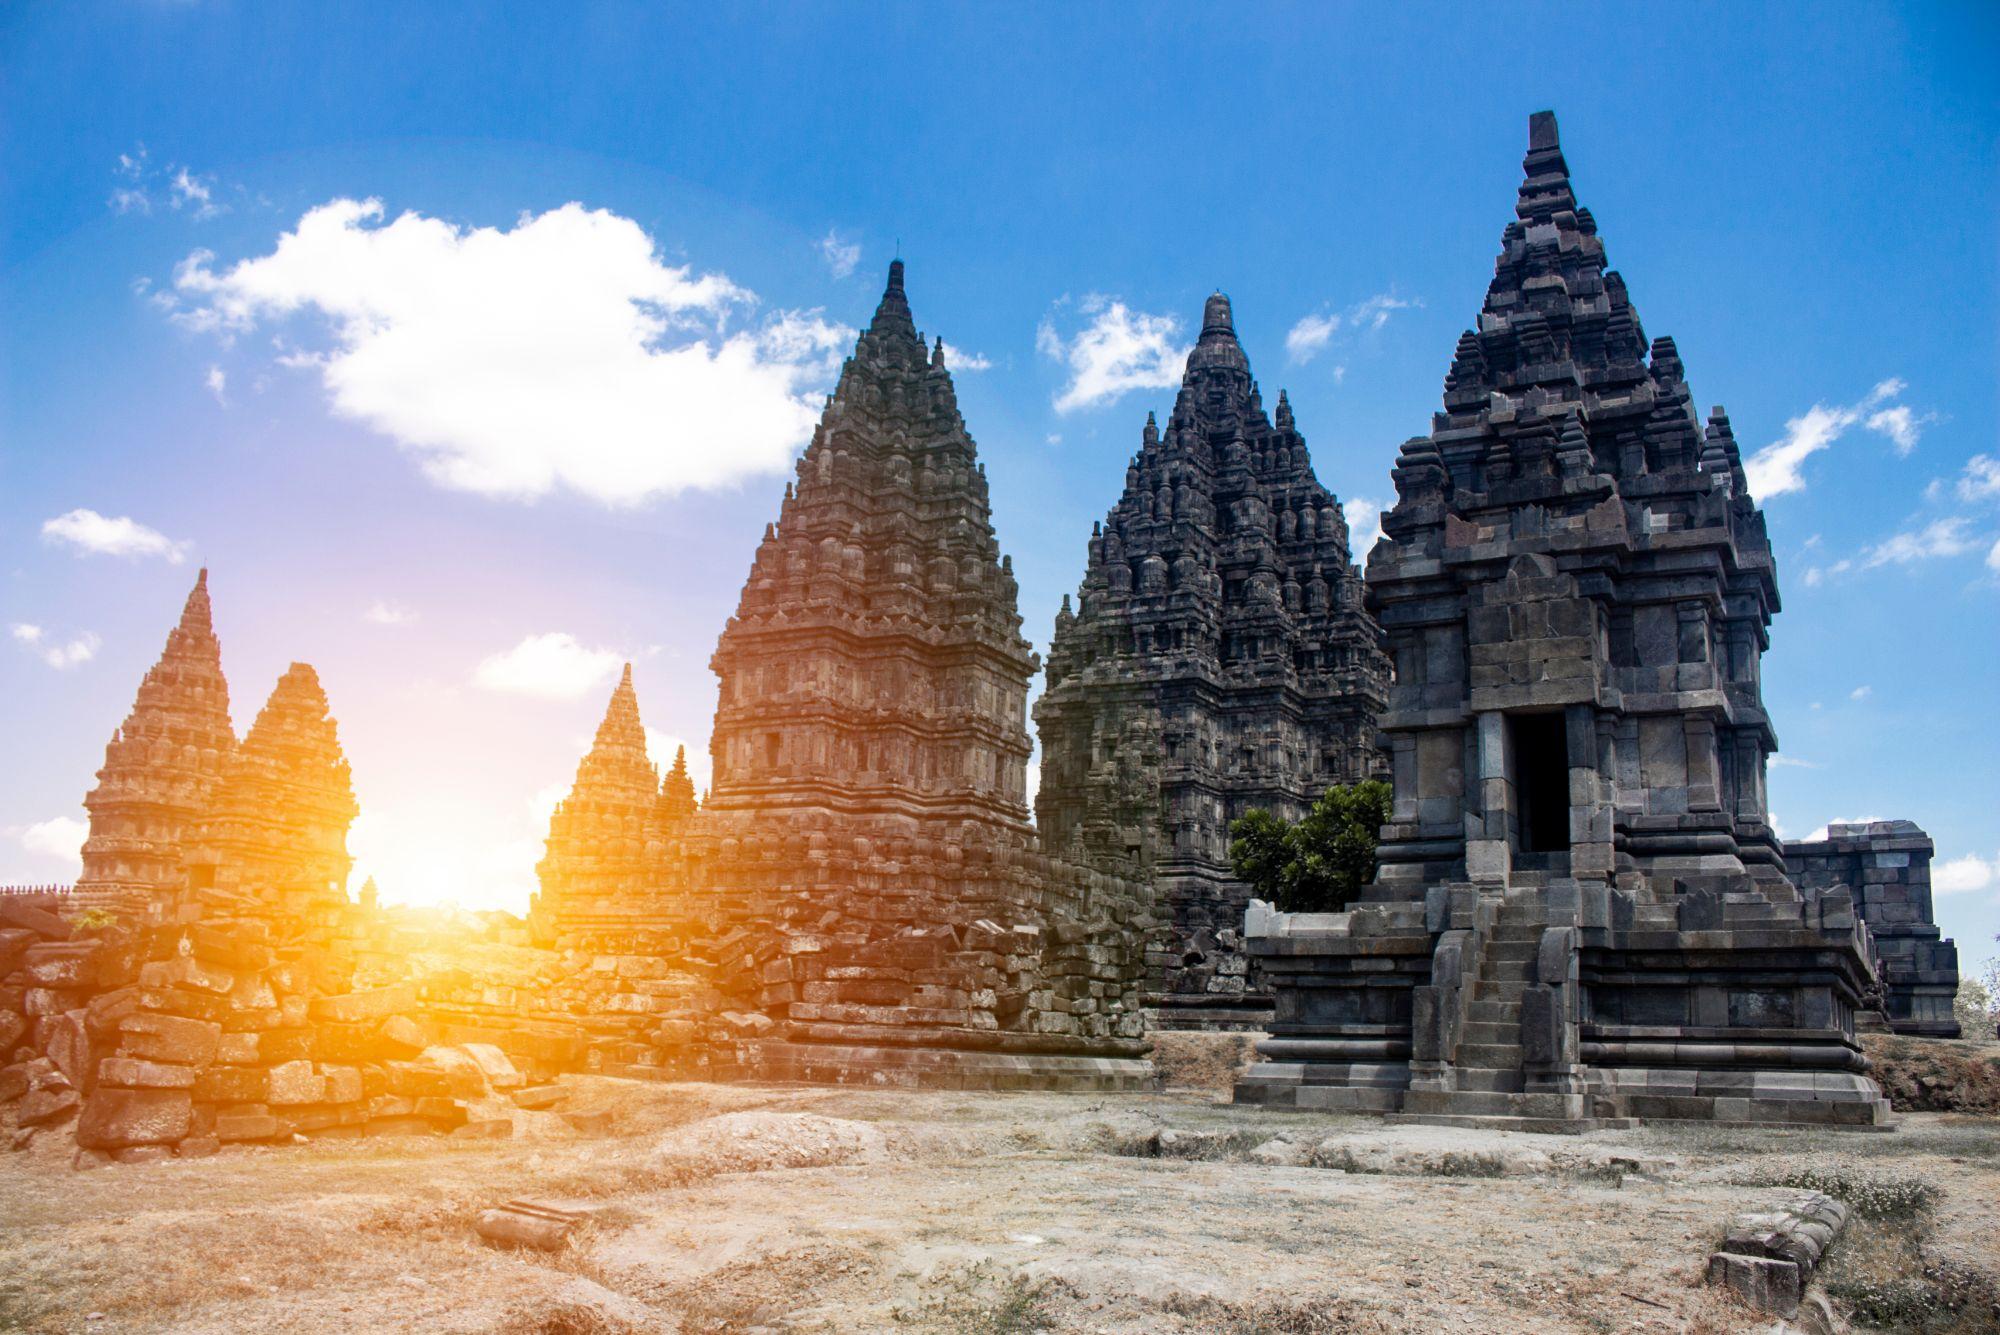 Indonesie Java Jogjakarta Prambanan tempel